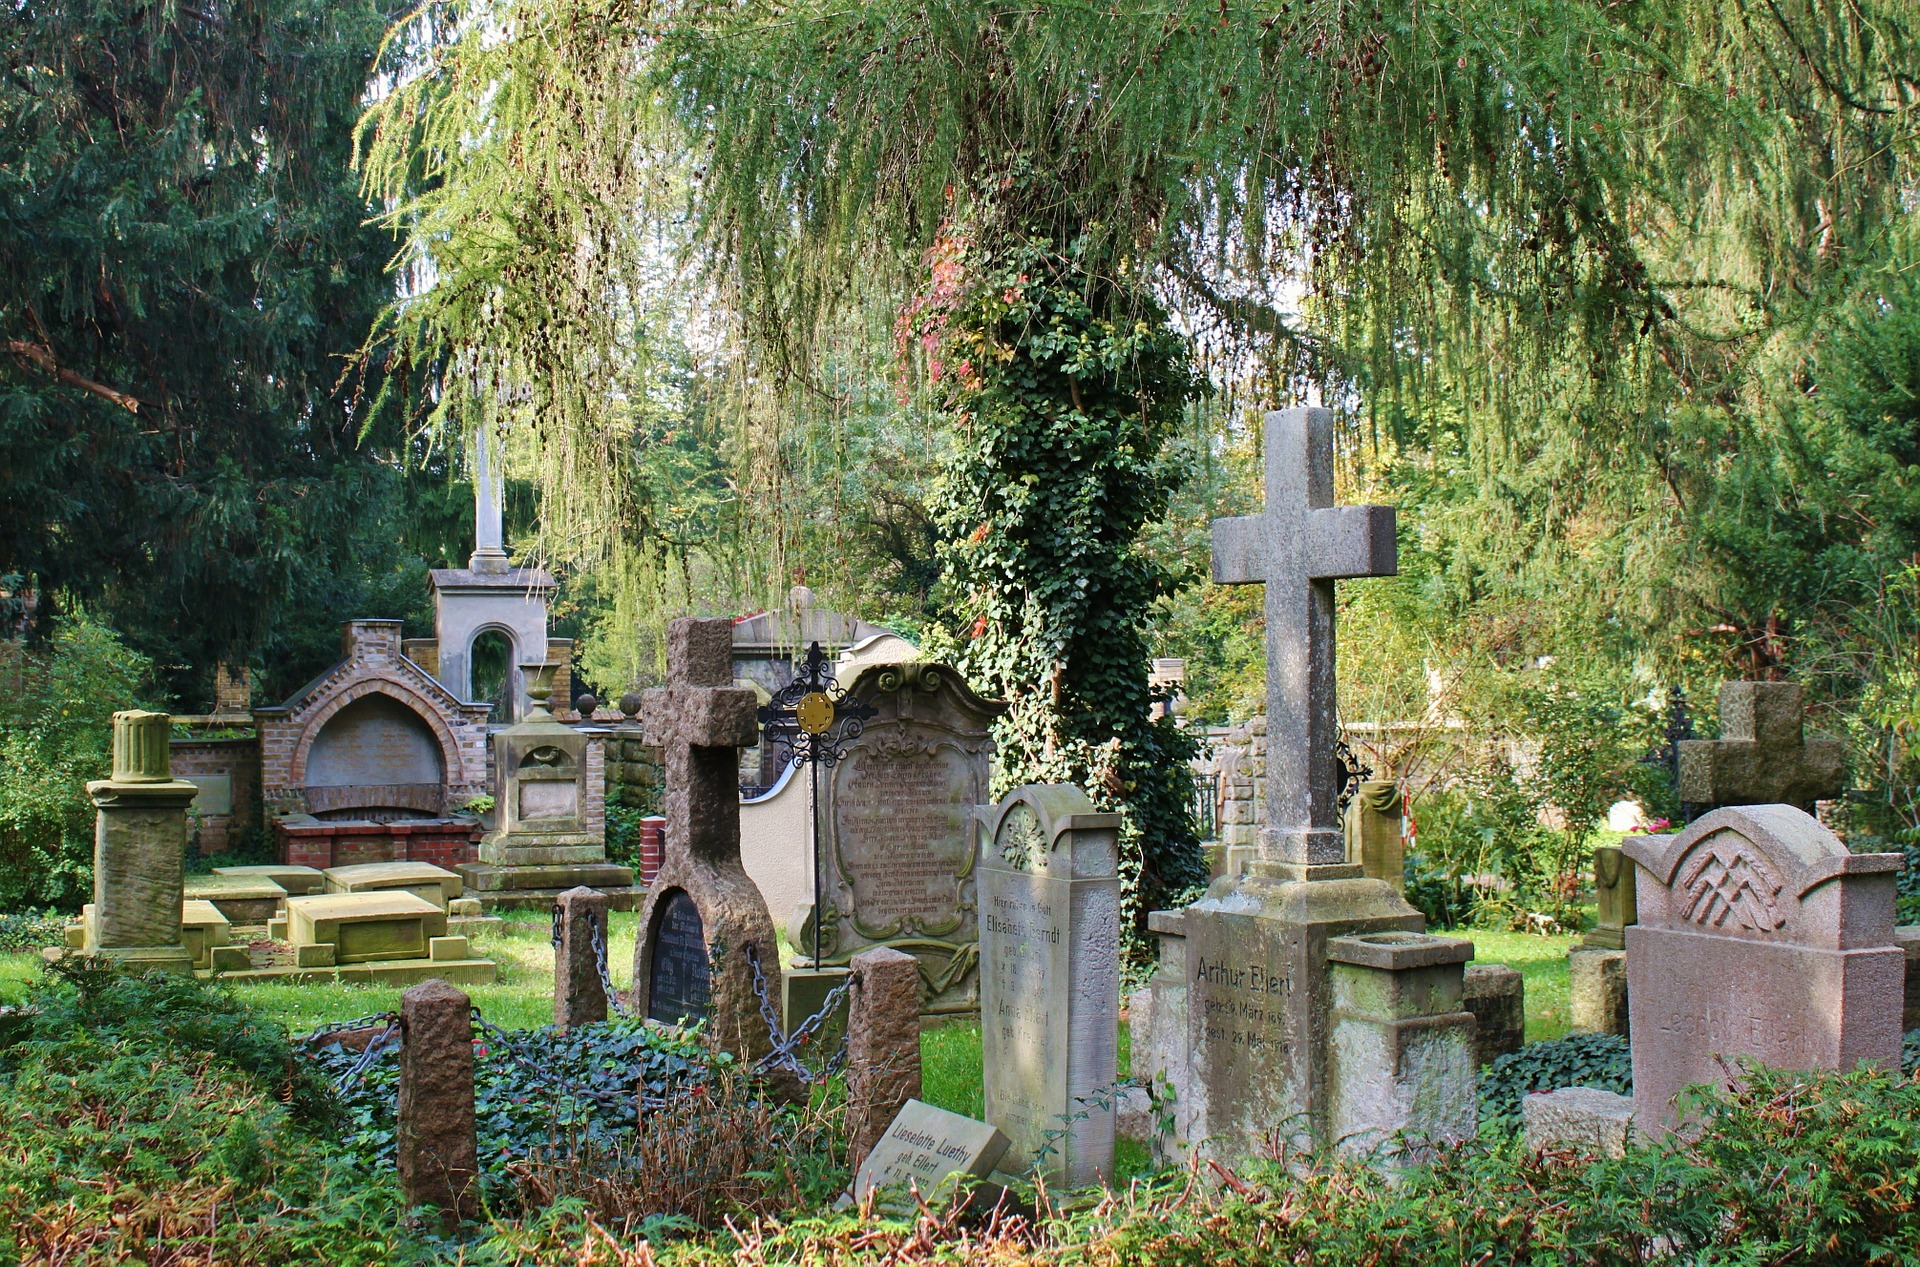 Graveyard, Architecture, Grave, Yard, HQ Photo